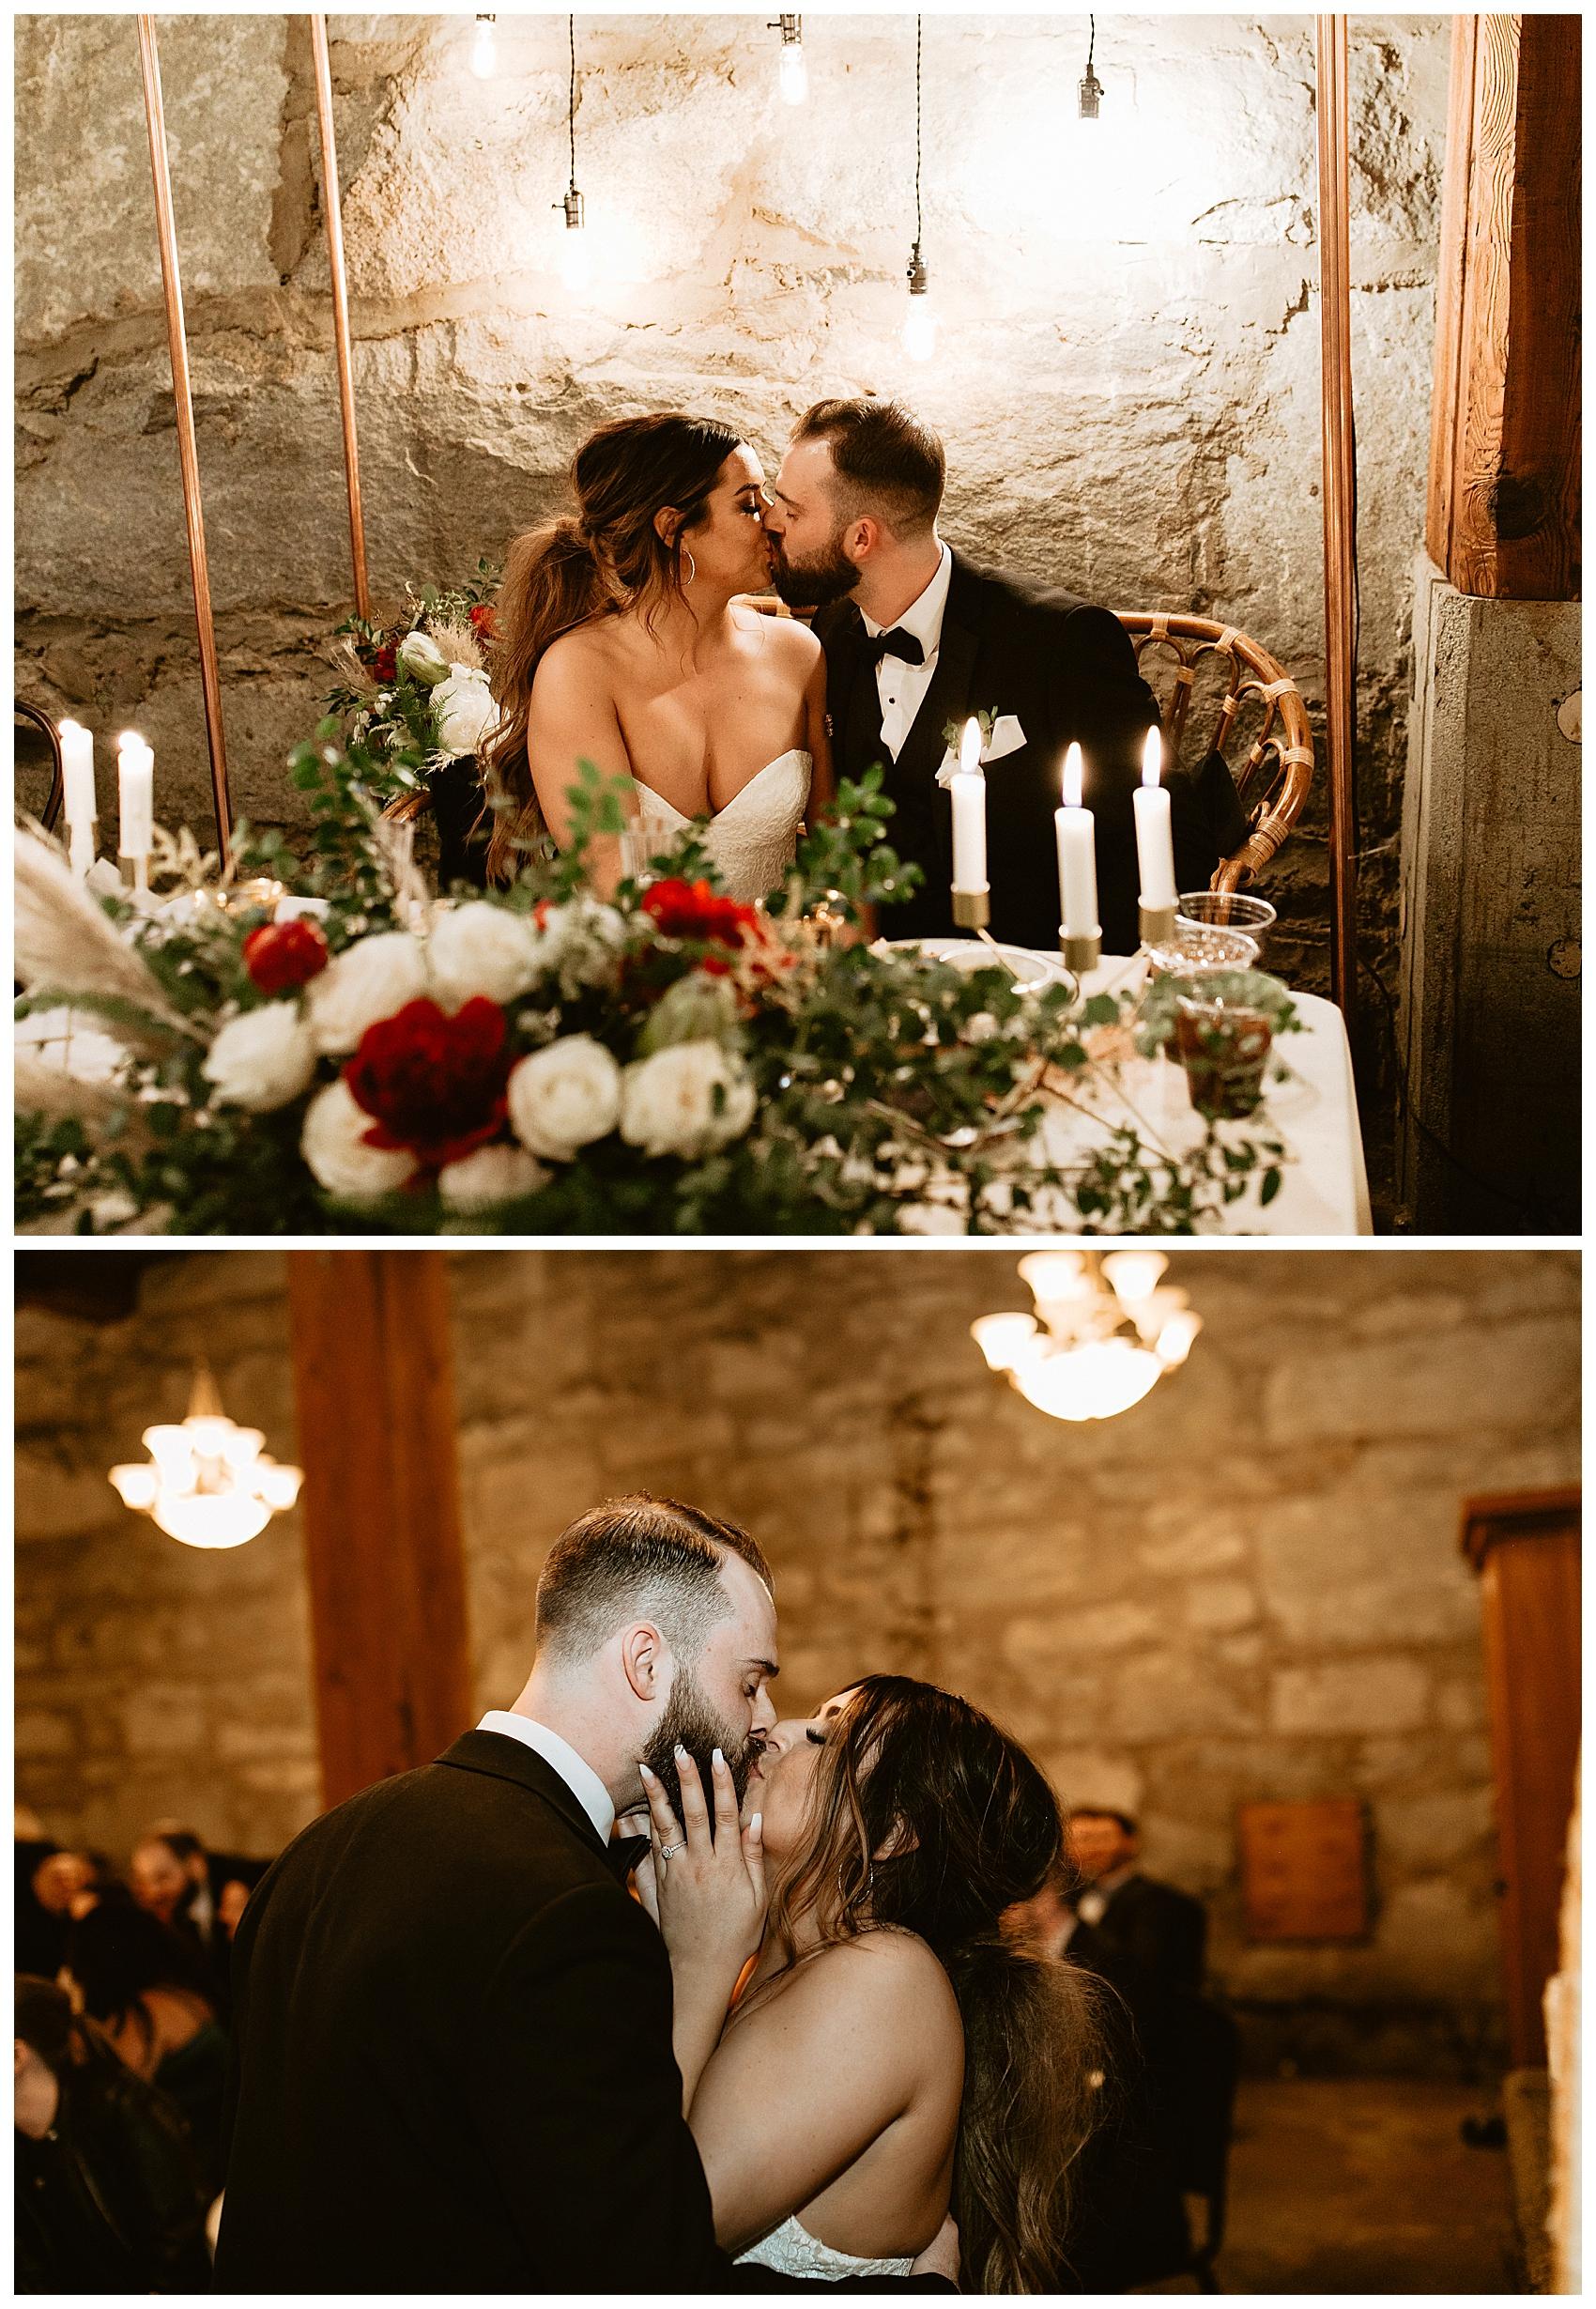 Chateau Rive Spokane Wedding Cassie Trottier Photography01104.jpg